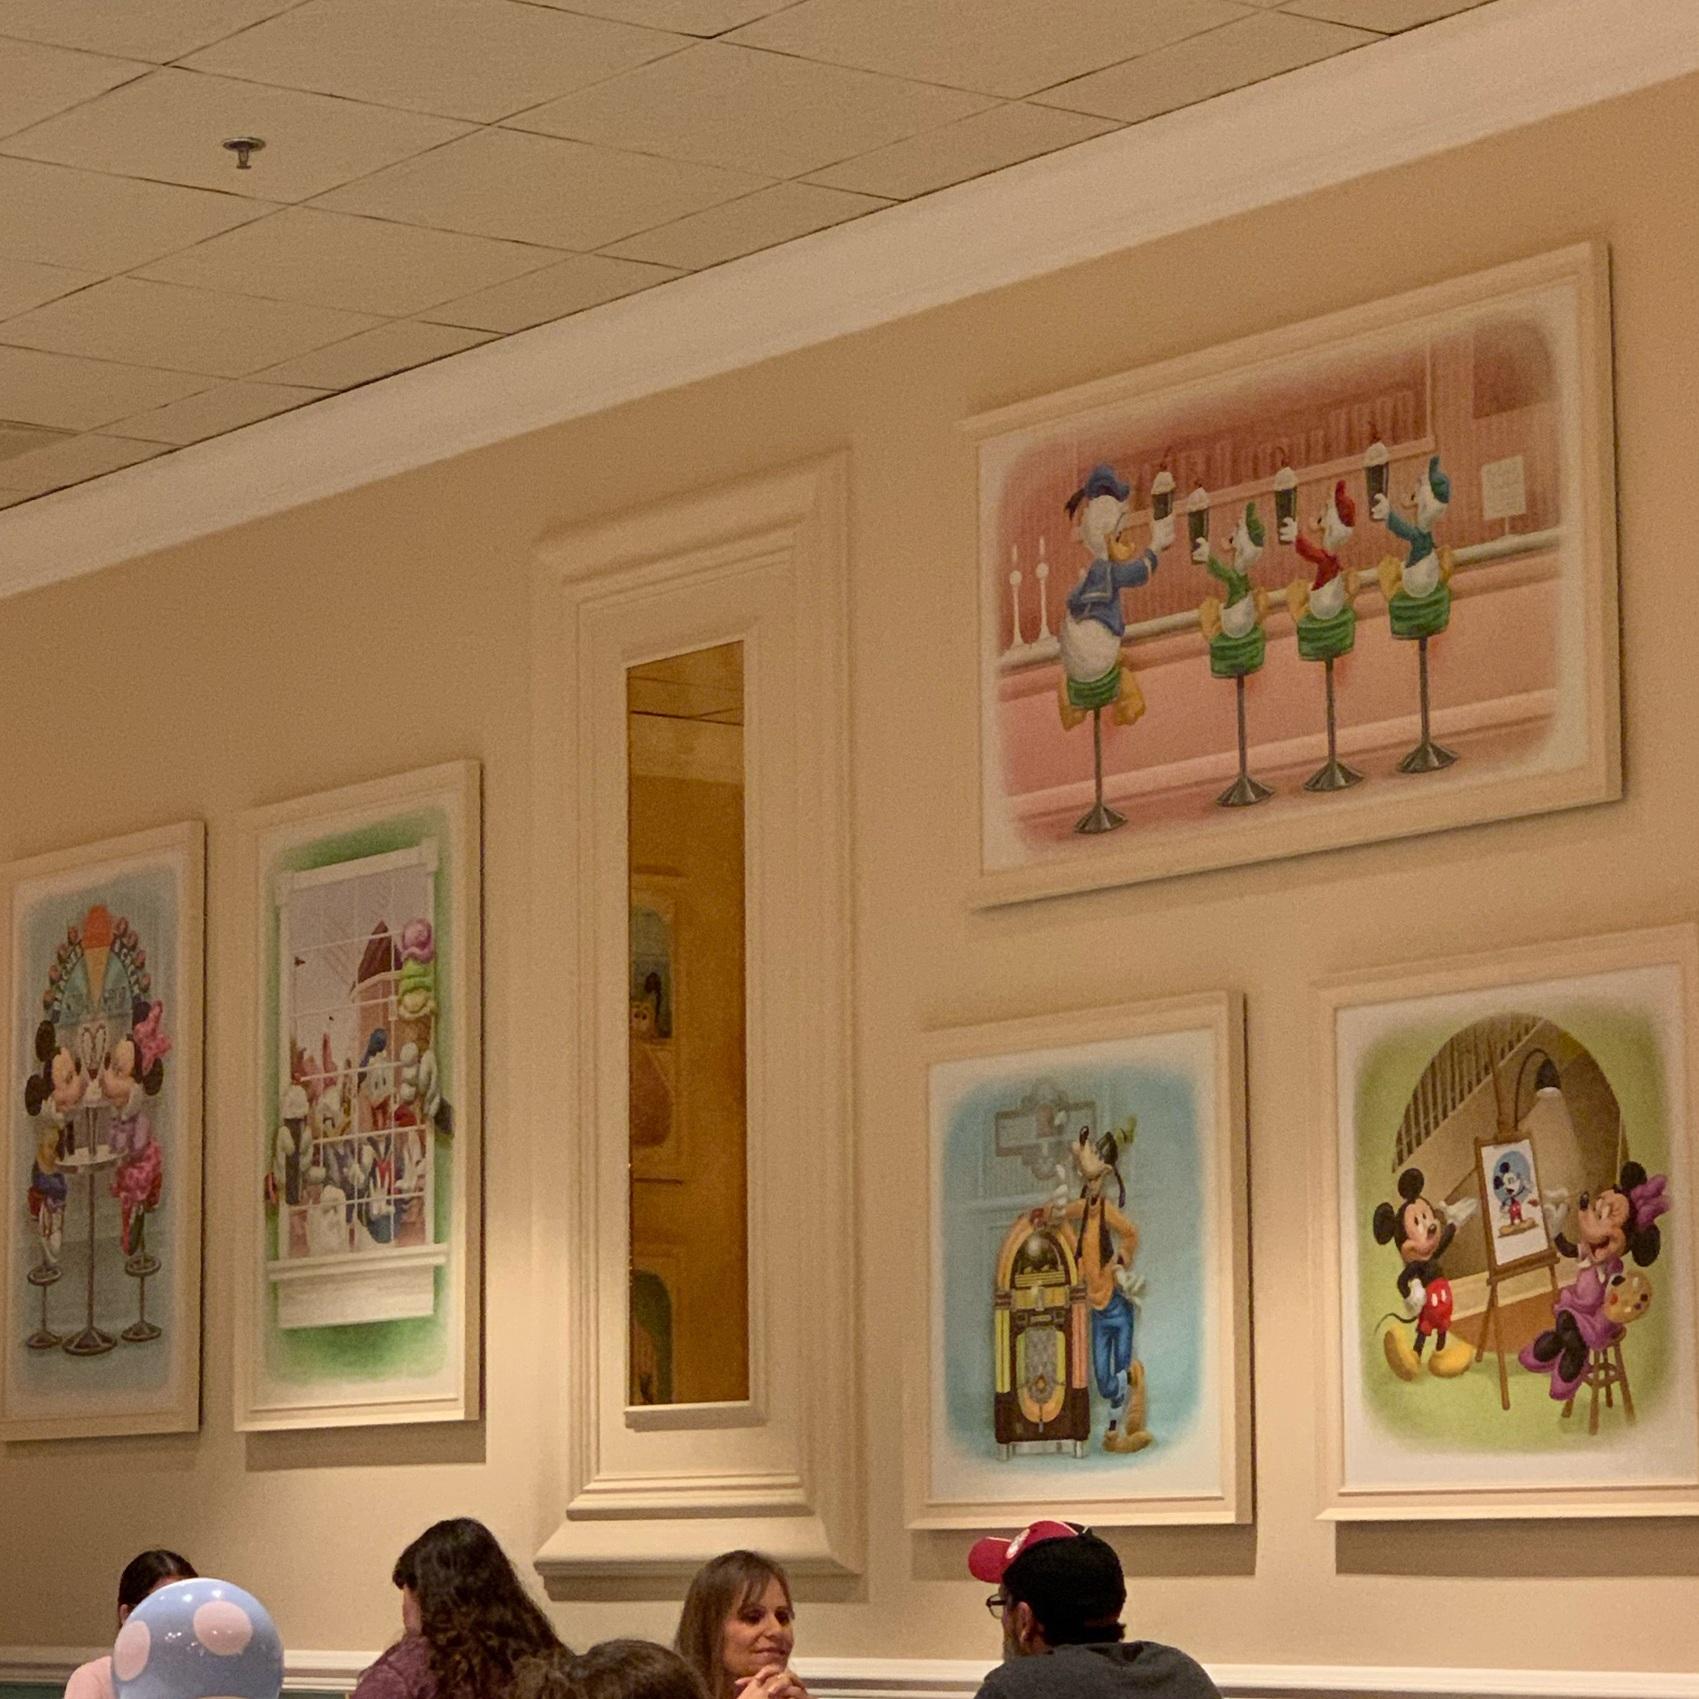 Disney Artwork at Beaches & Cream (Beaches & Cream Soda Shop)